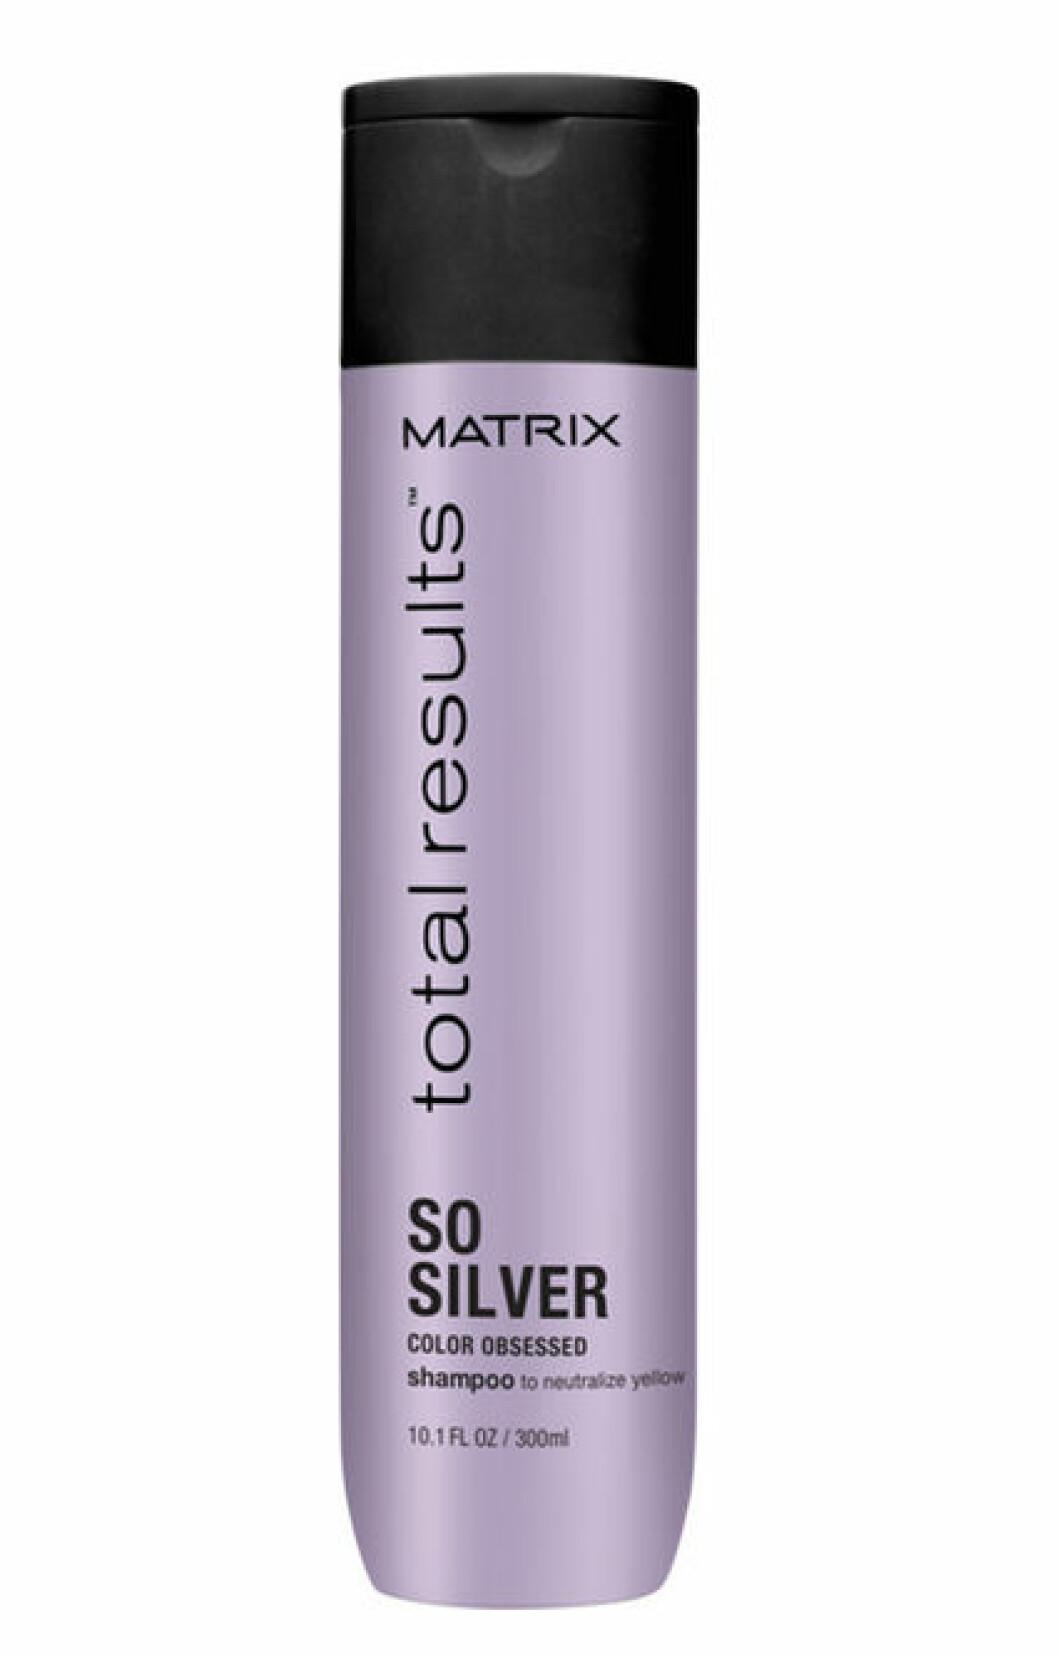 Matrix silverschampo recension